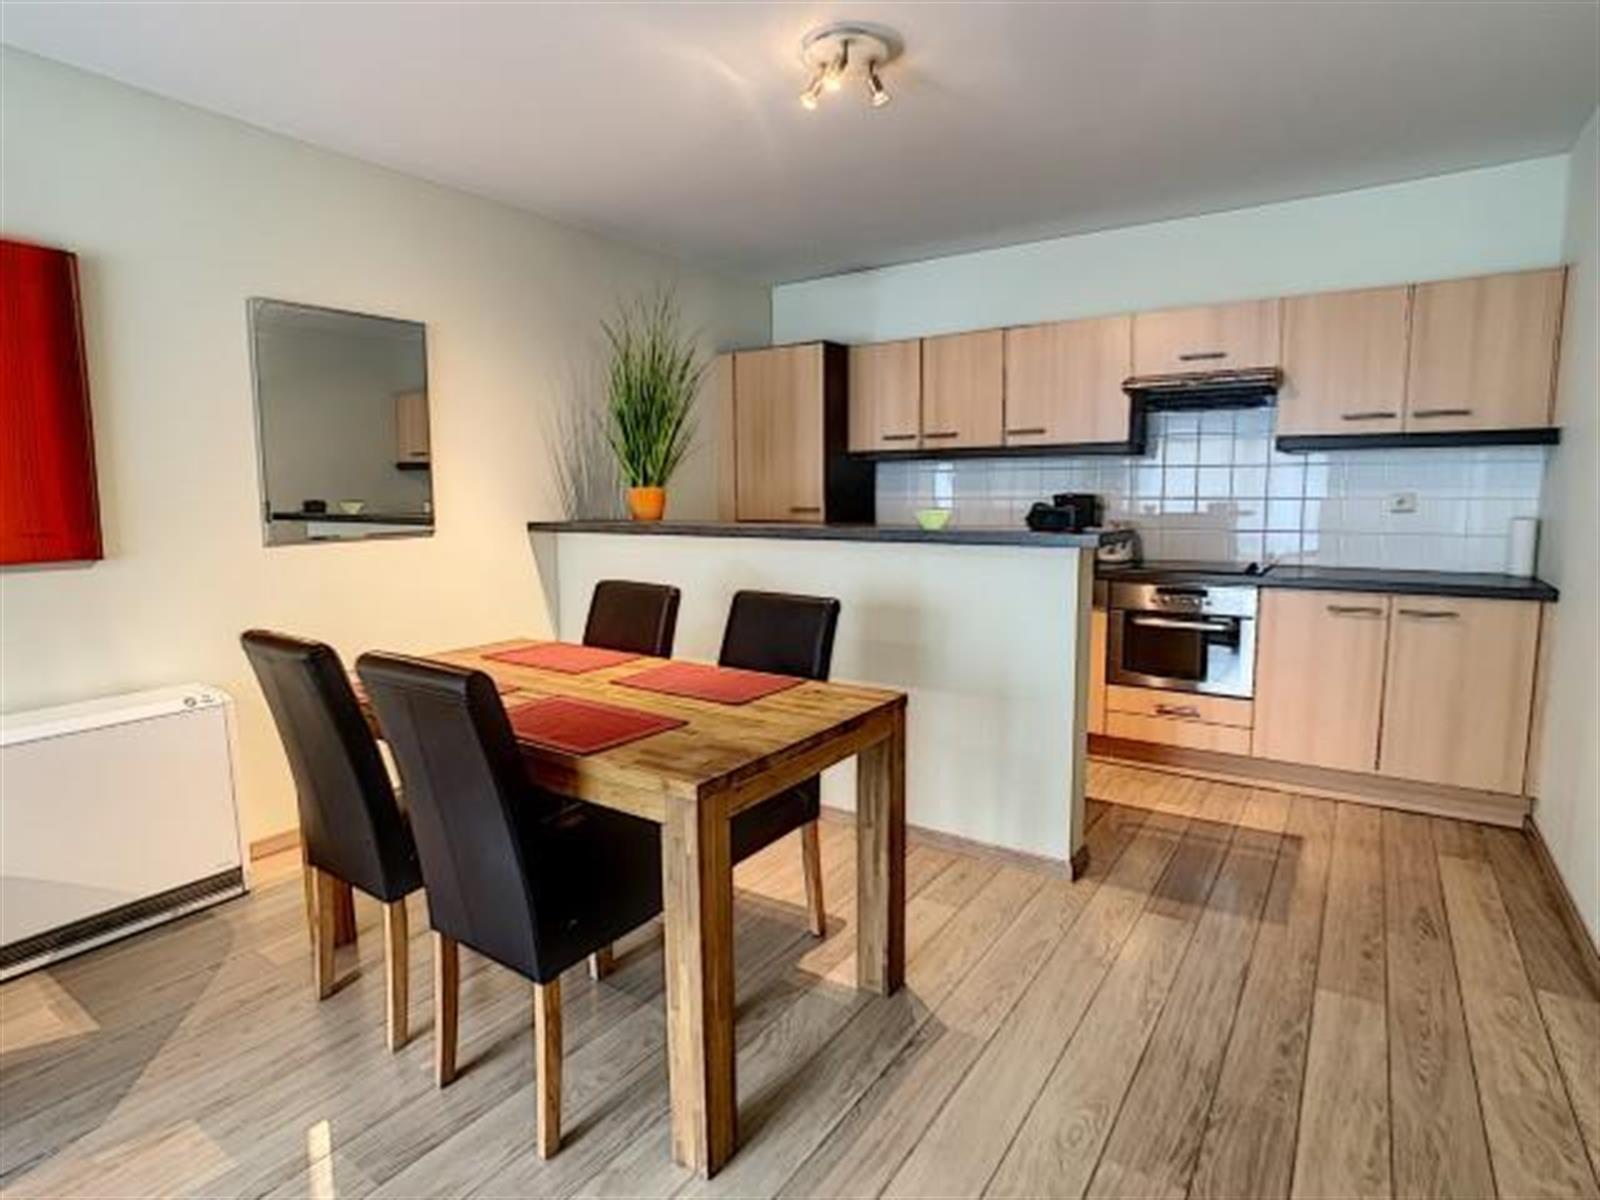 Appartement - Woluwe-Saint-Lambert - #4147227-1